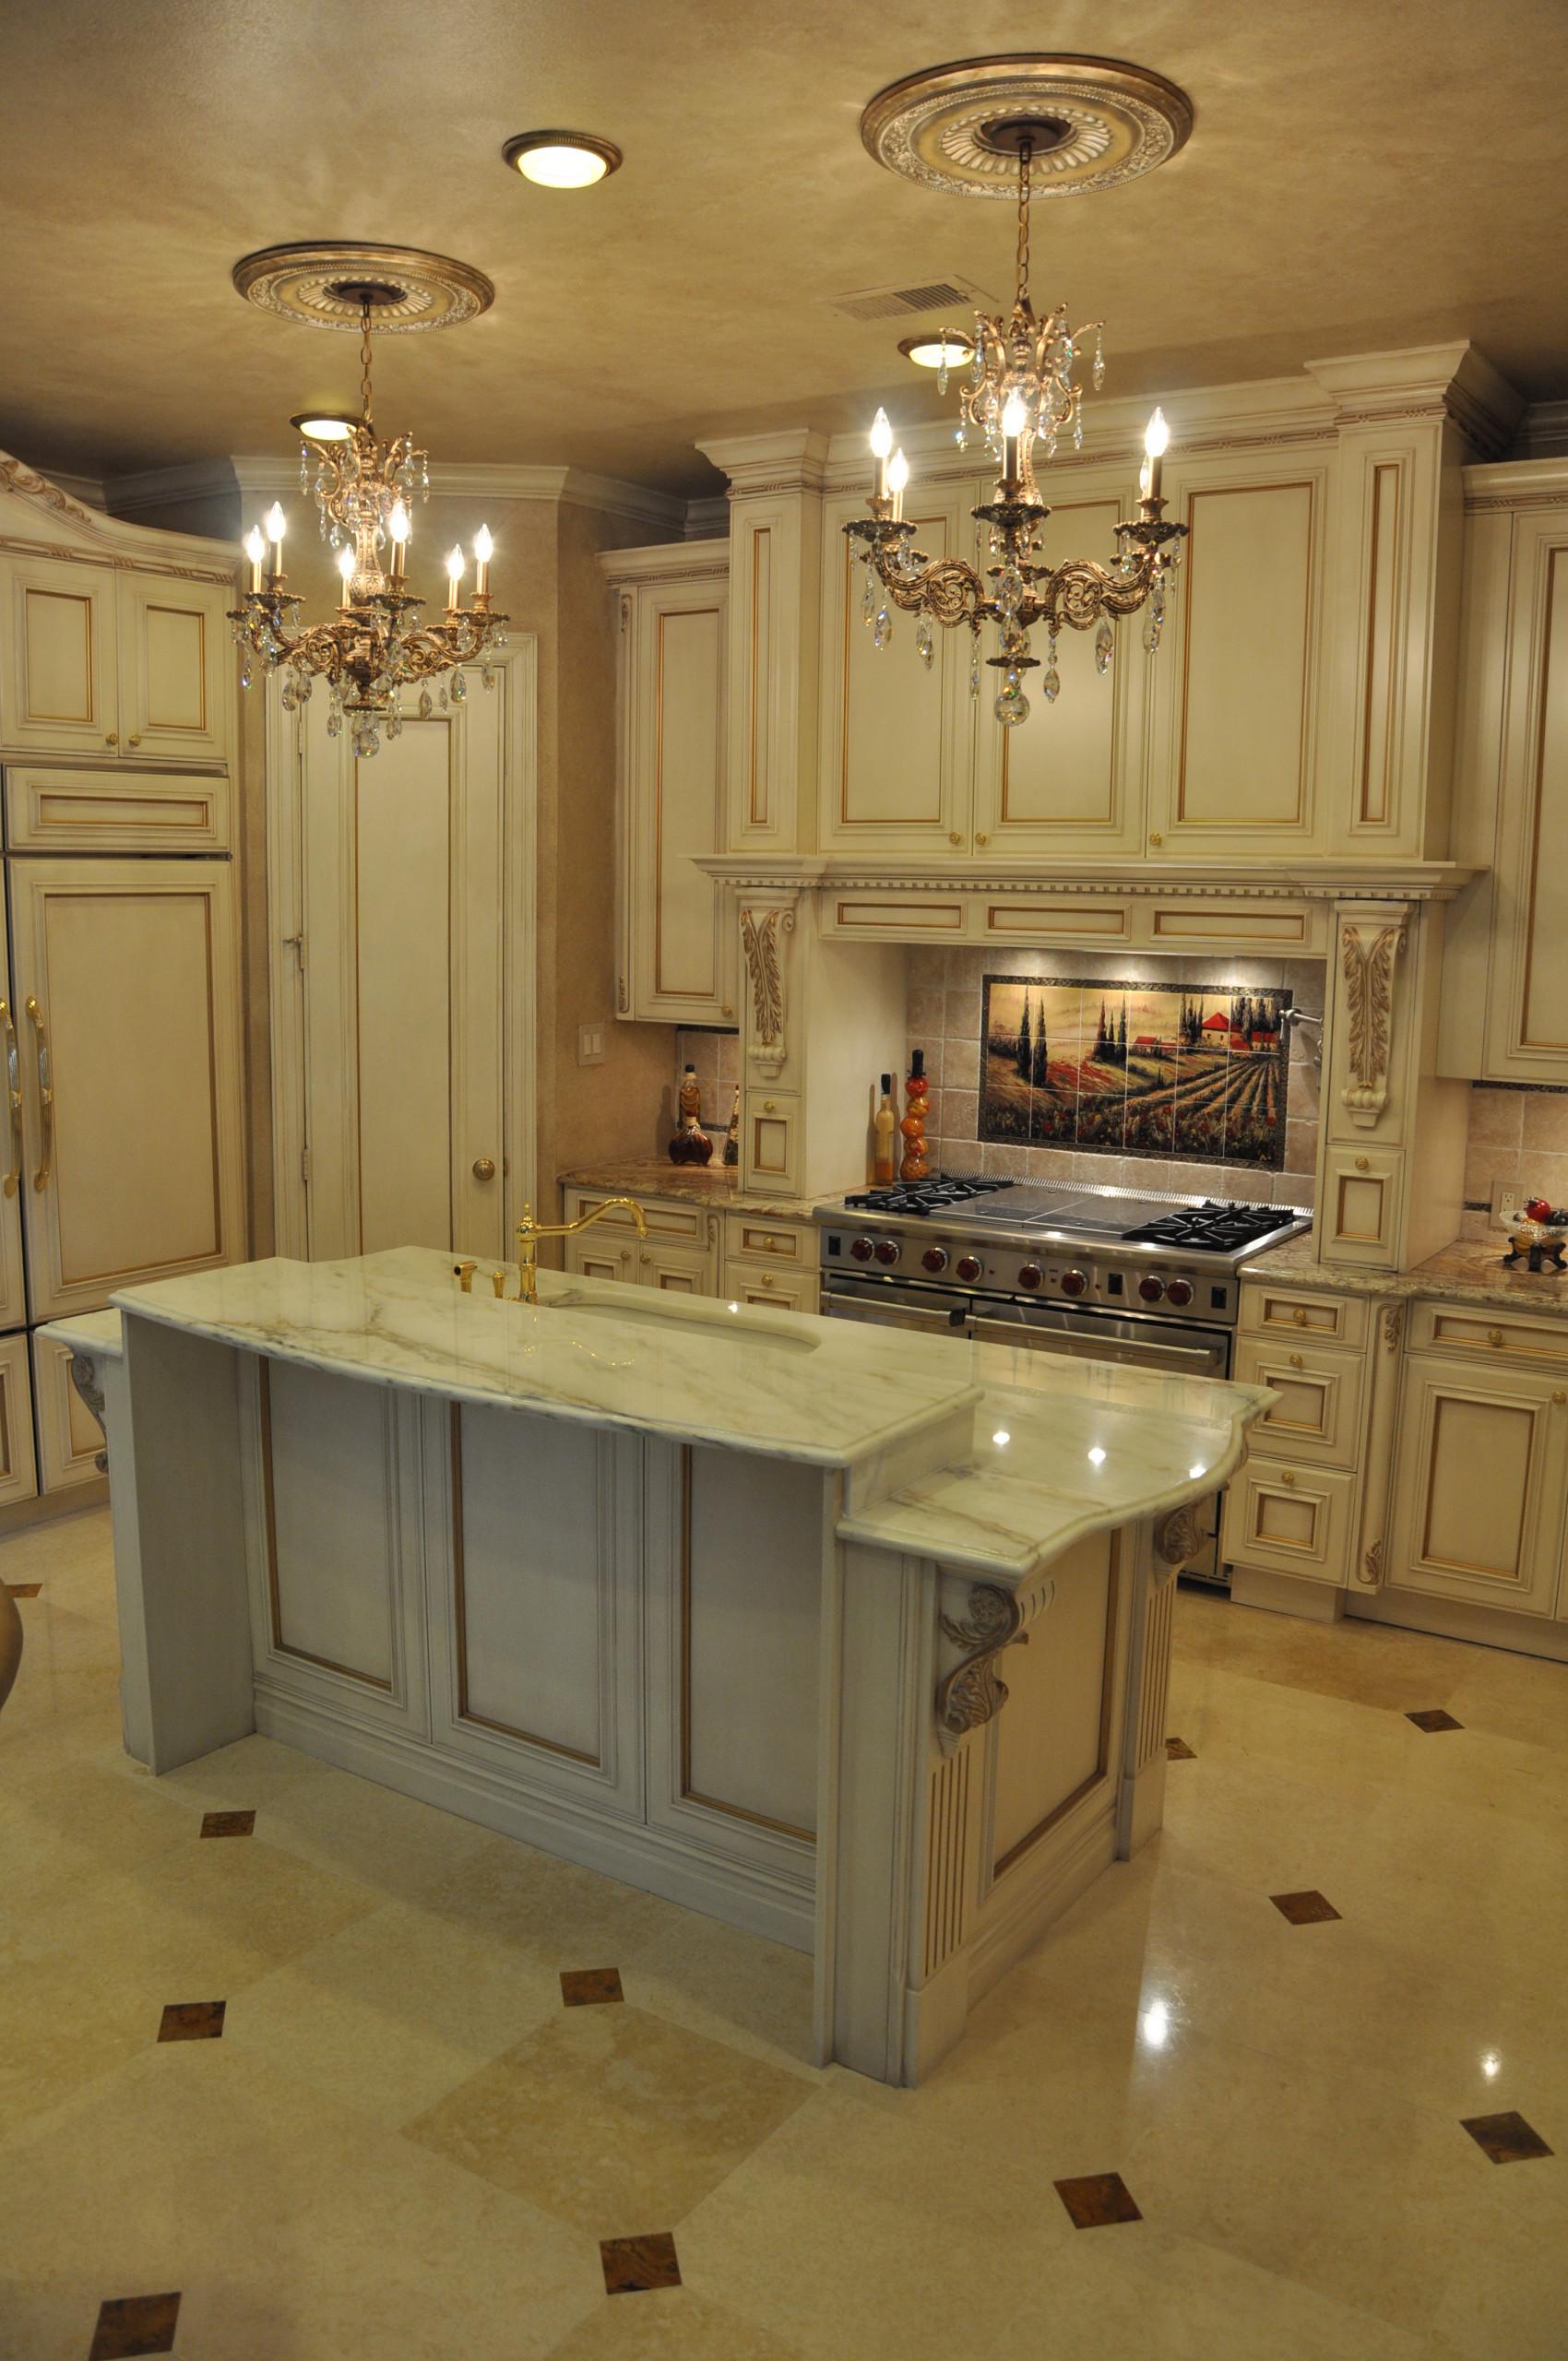 Kitchen and floor remodel.